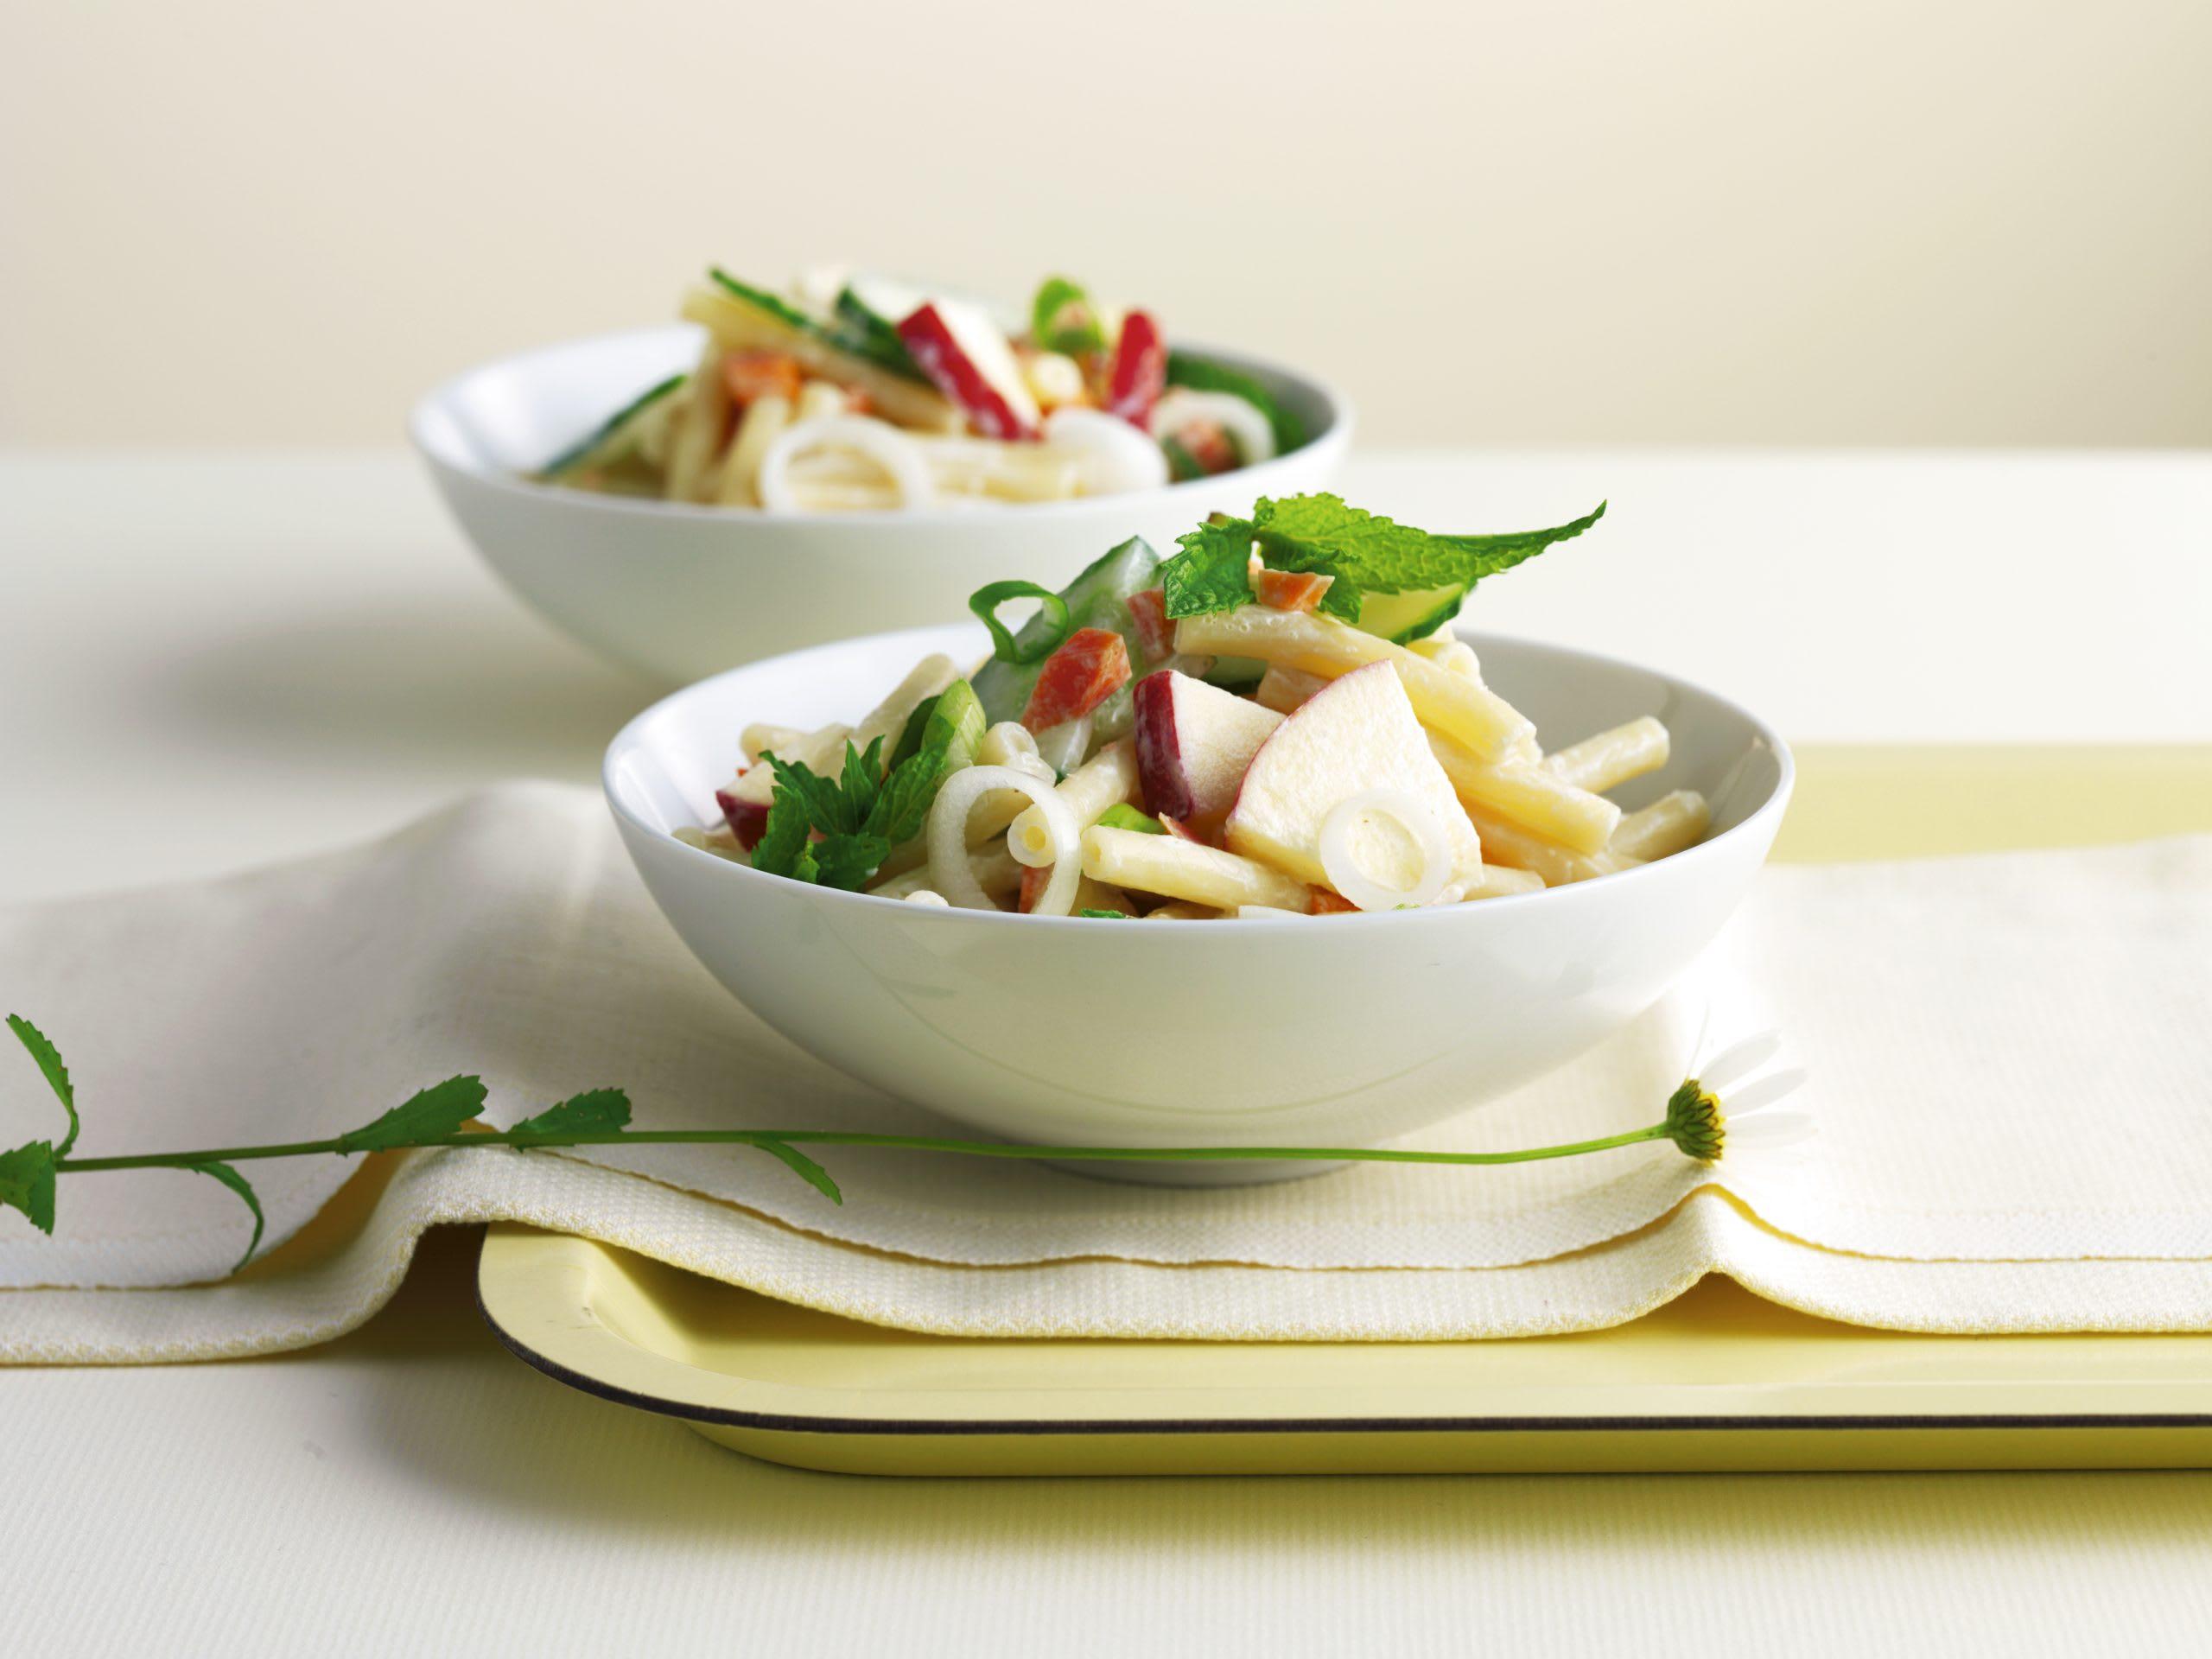 Salade de macaroni sauce au yogourt